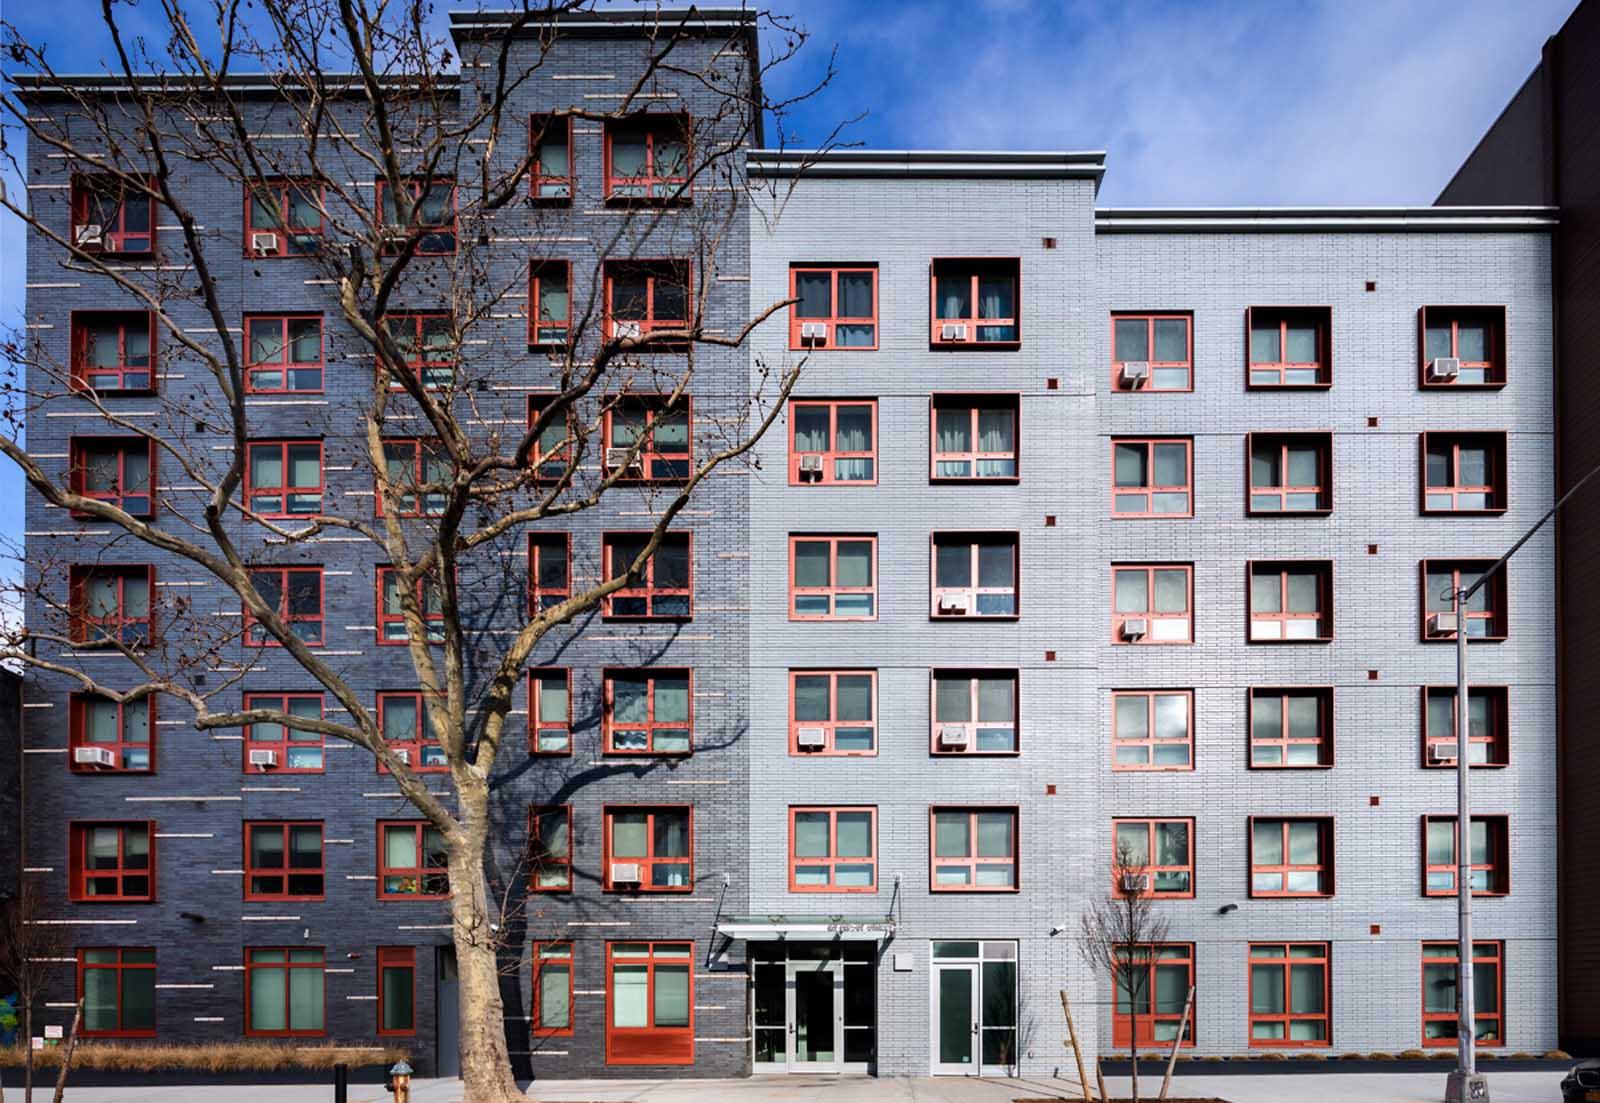 Frost Street Apartments, 59 Frost Street, Brooklyn, New York, 11211